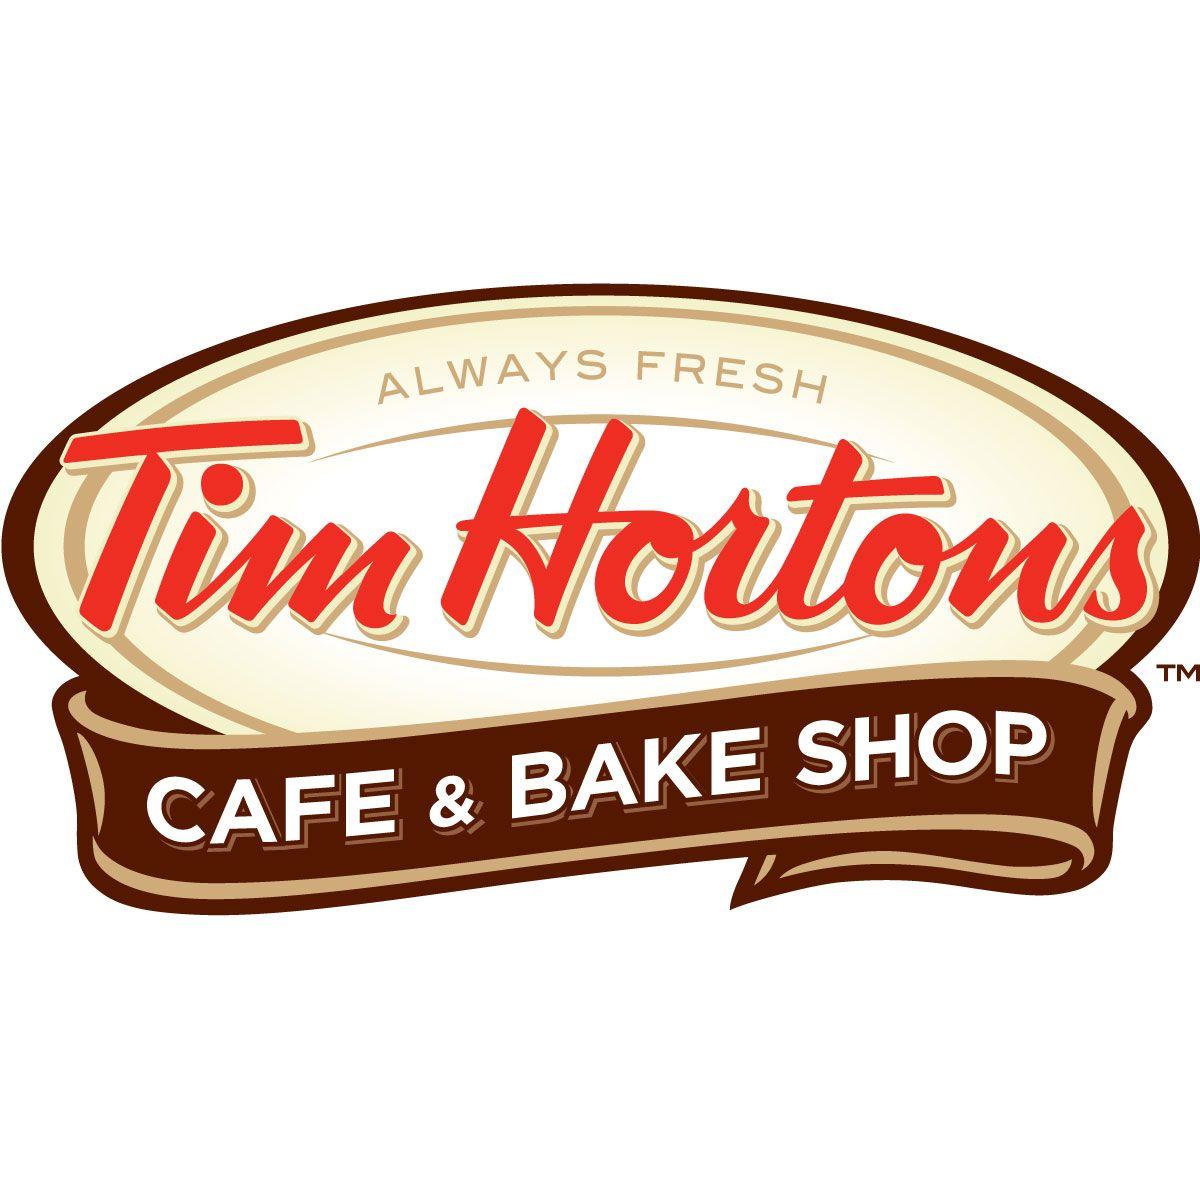 Franchising tim hortons free food restaurant offers